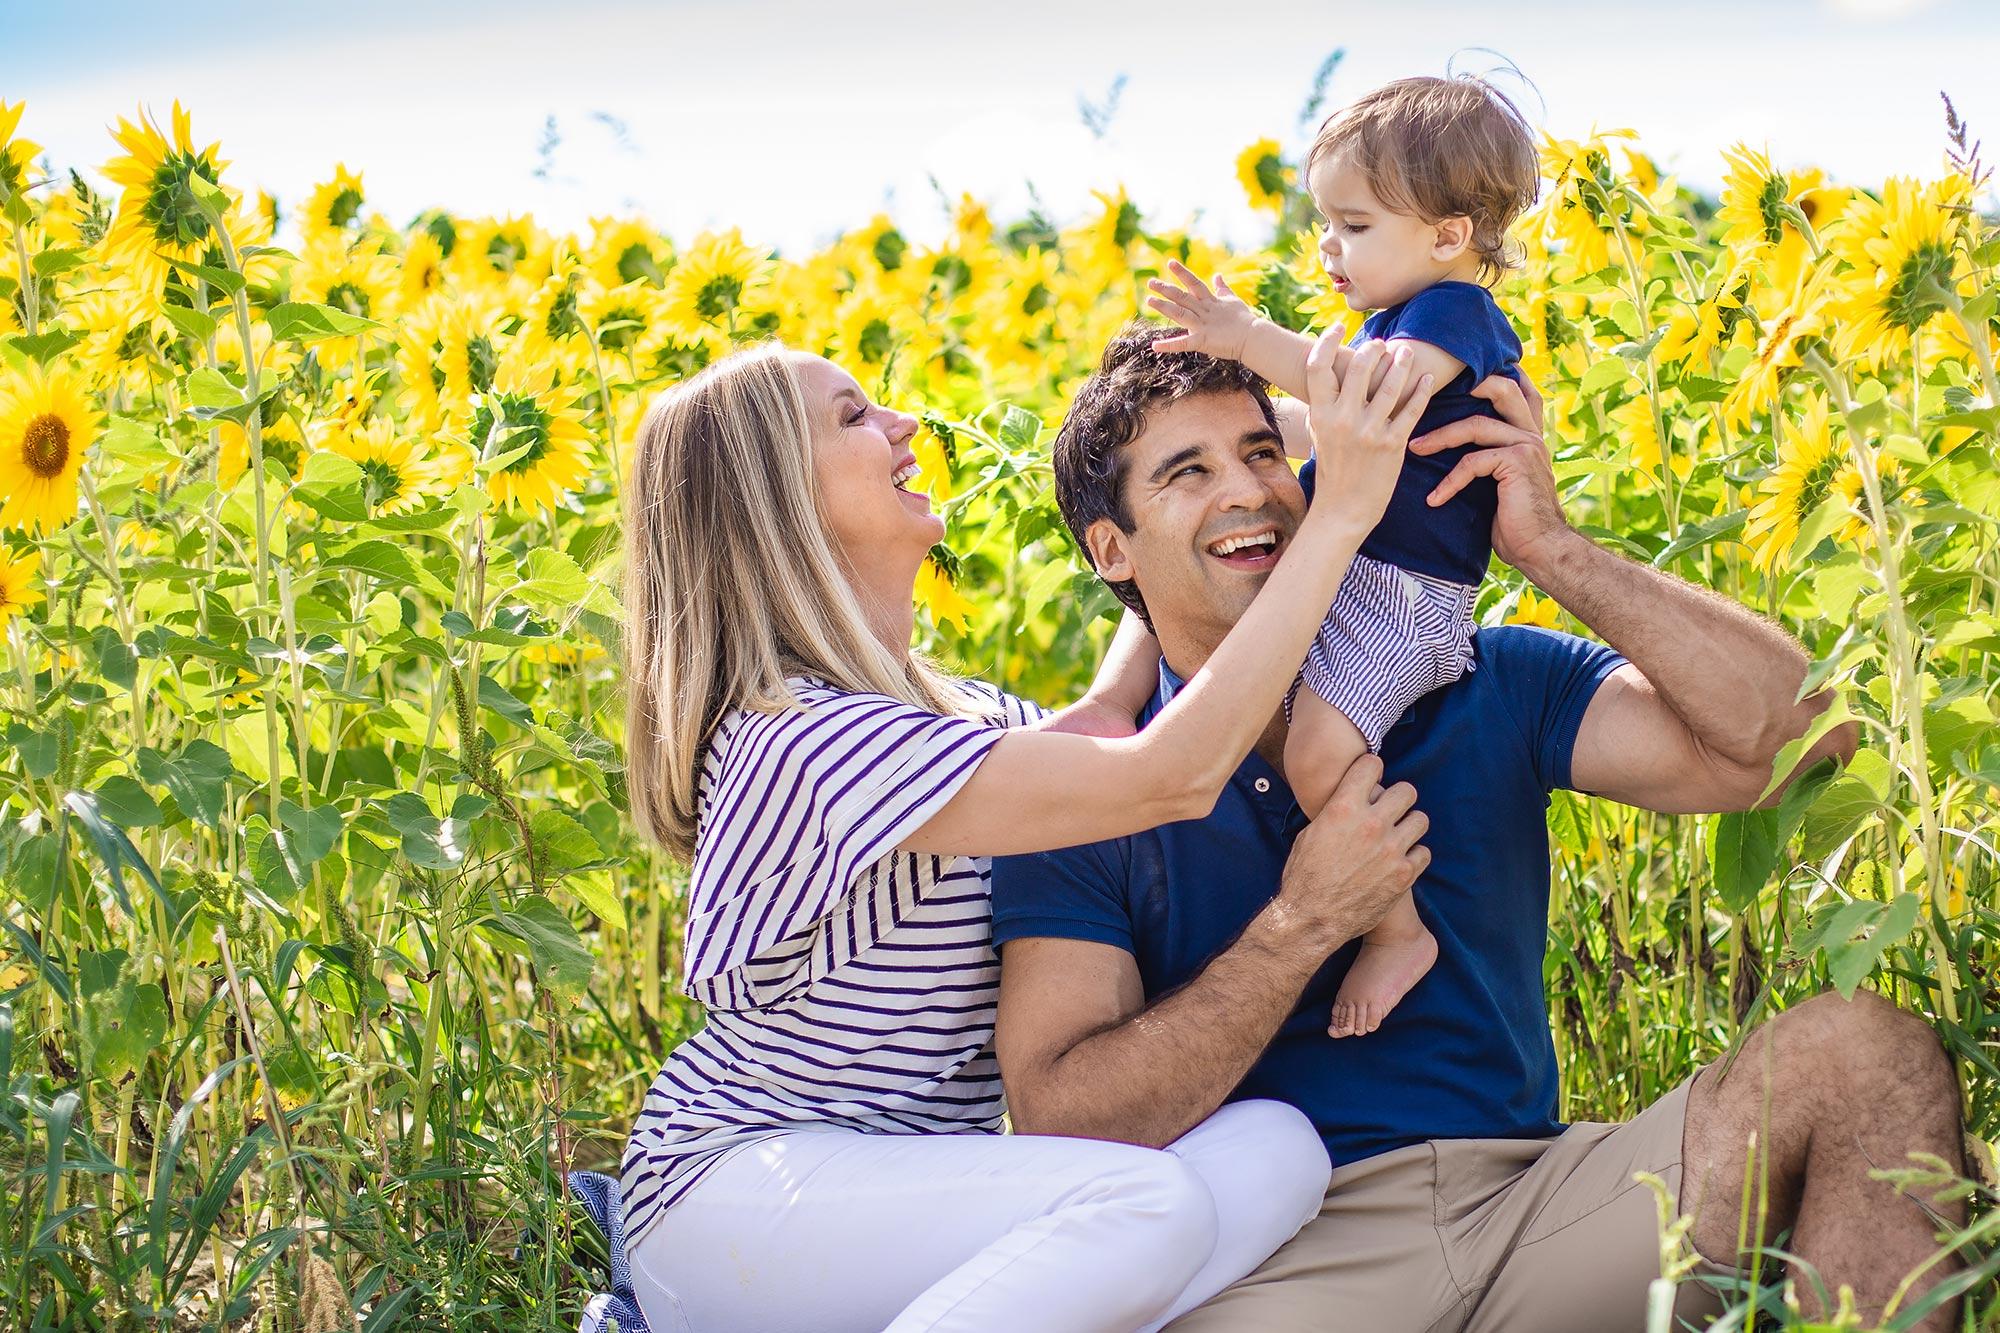 Newburyport Family Portrait Session   Stephen Grant Photography